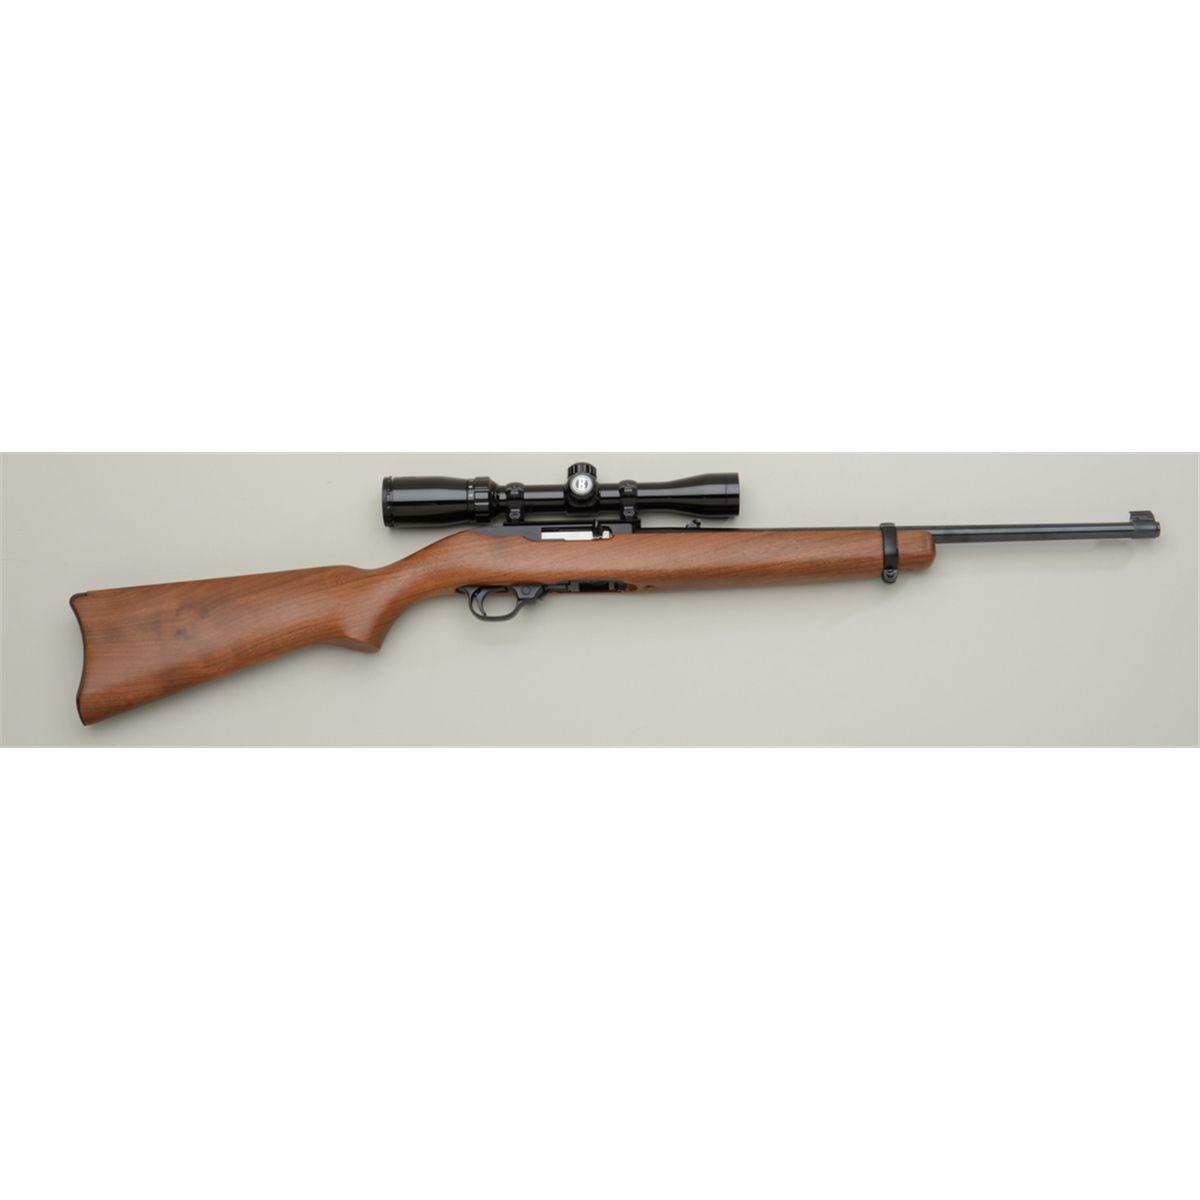 "Ruger Model 10/22 semi-auto rifle,  22LR cal , 18-1/2"" barrel, black  finish, wood stock, mounted w"